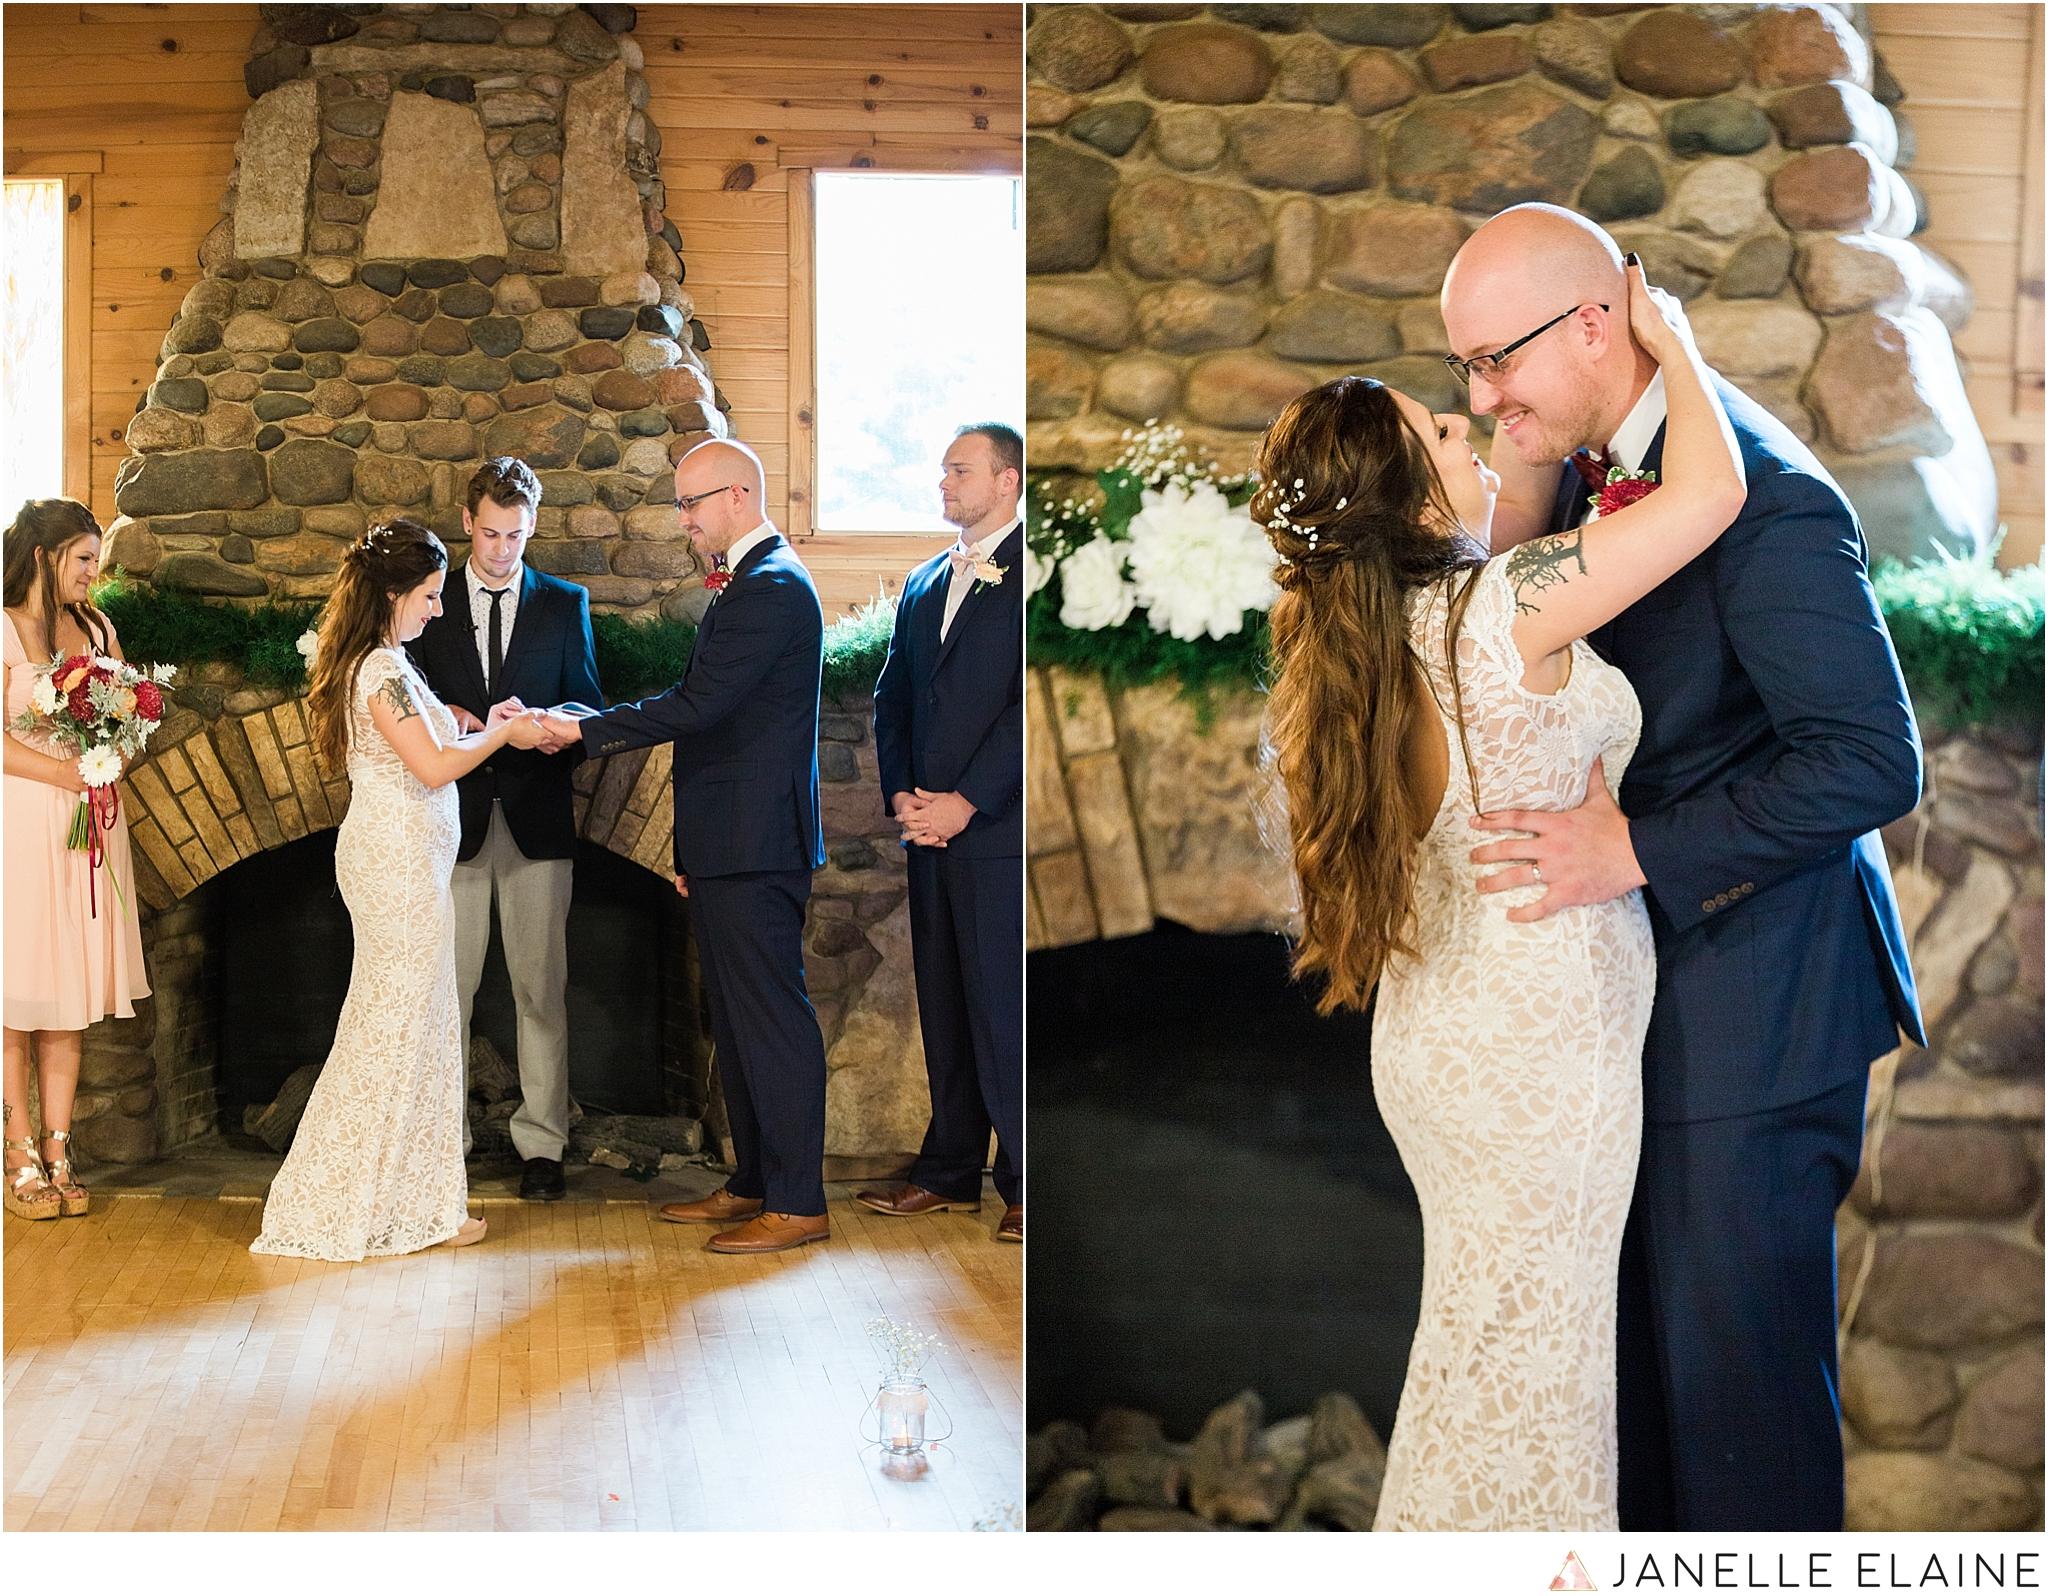 janelle elaine photography-seattle-destination-wedding-photographer-65.jpg